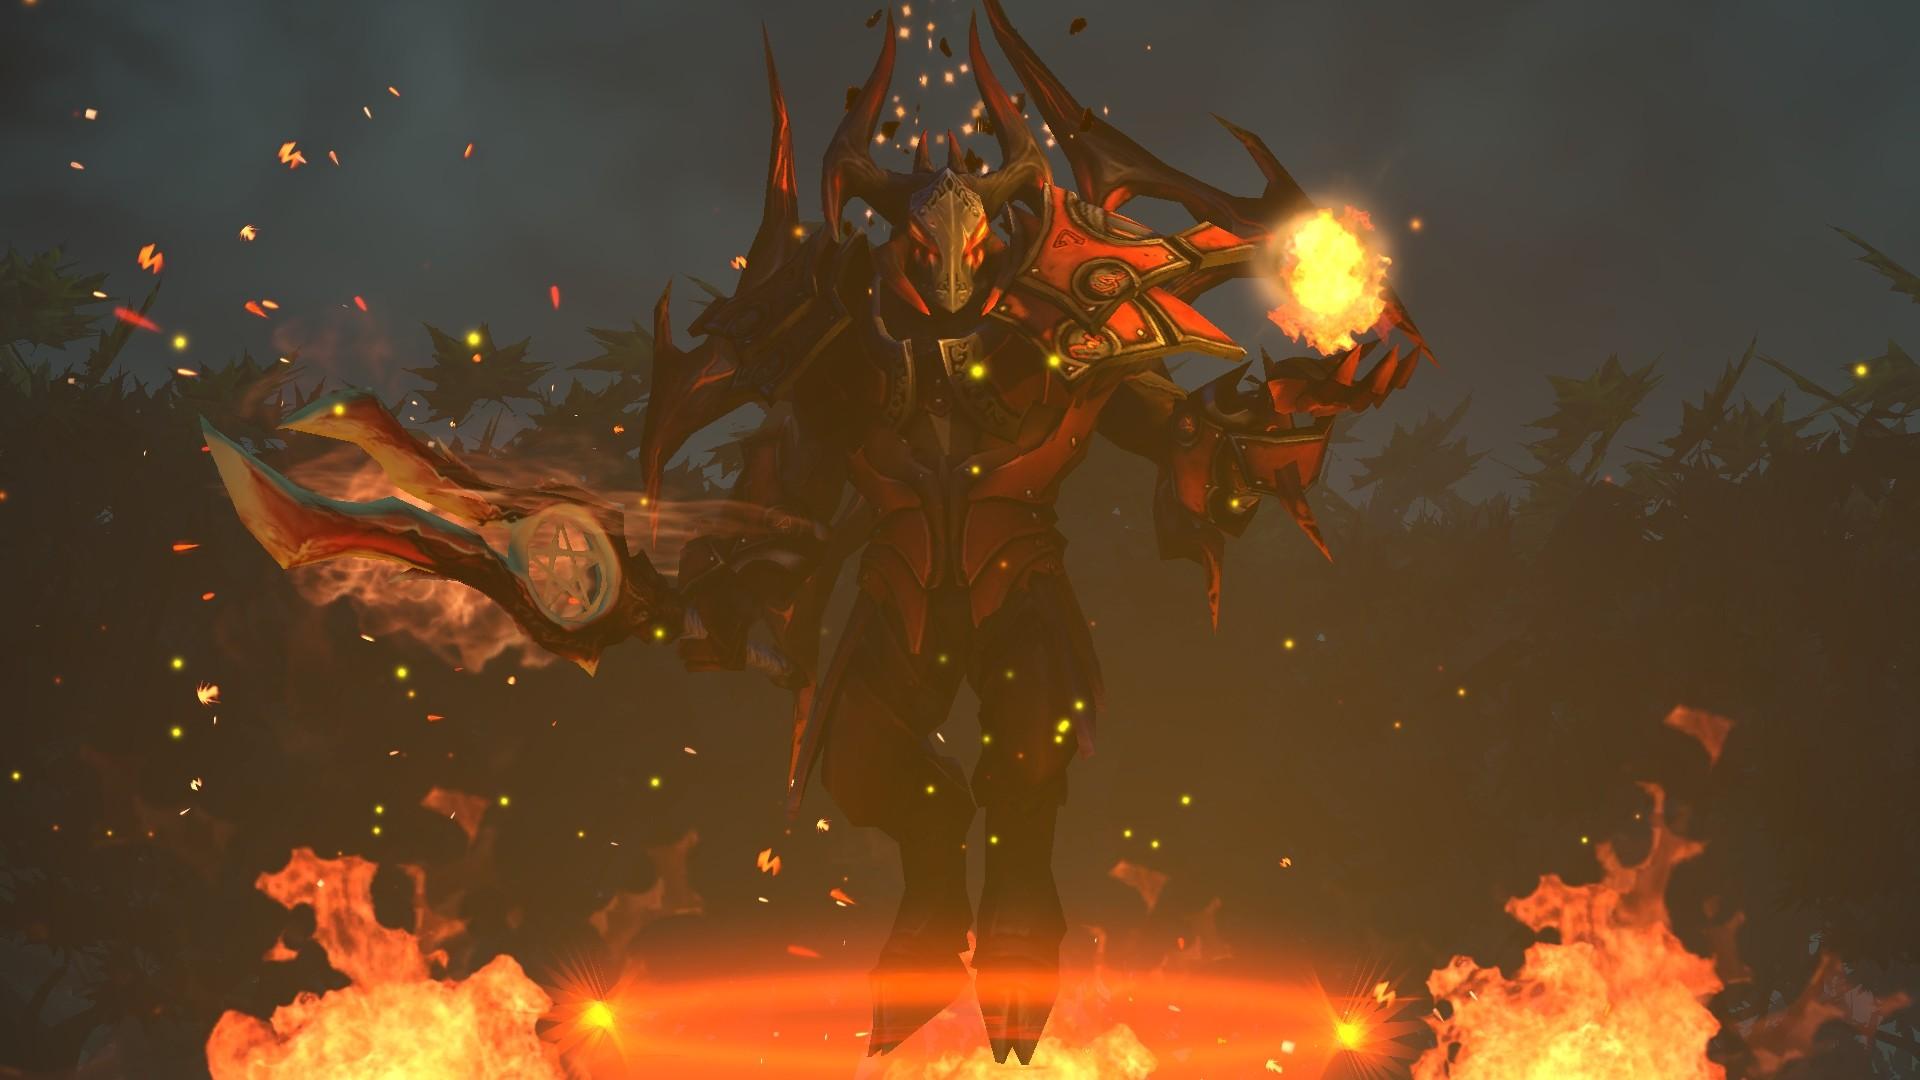 doom lucifer dota 2 set game hd wallpaper